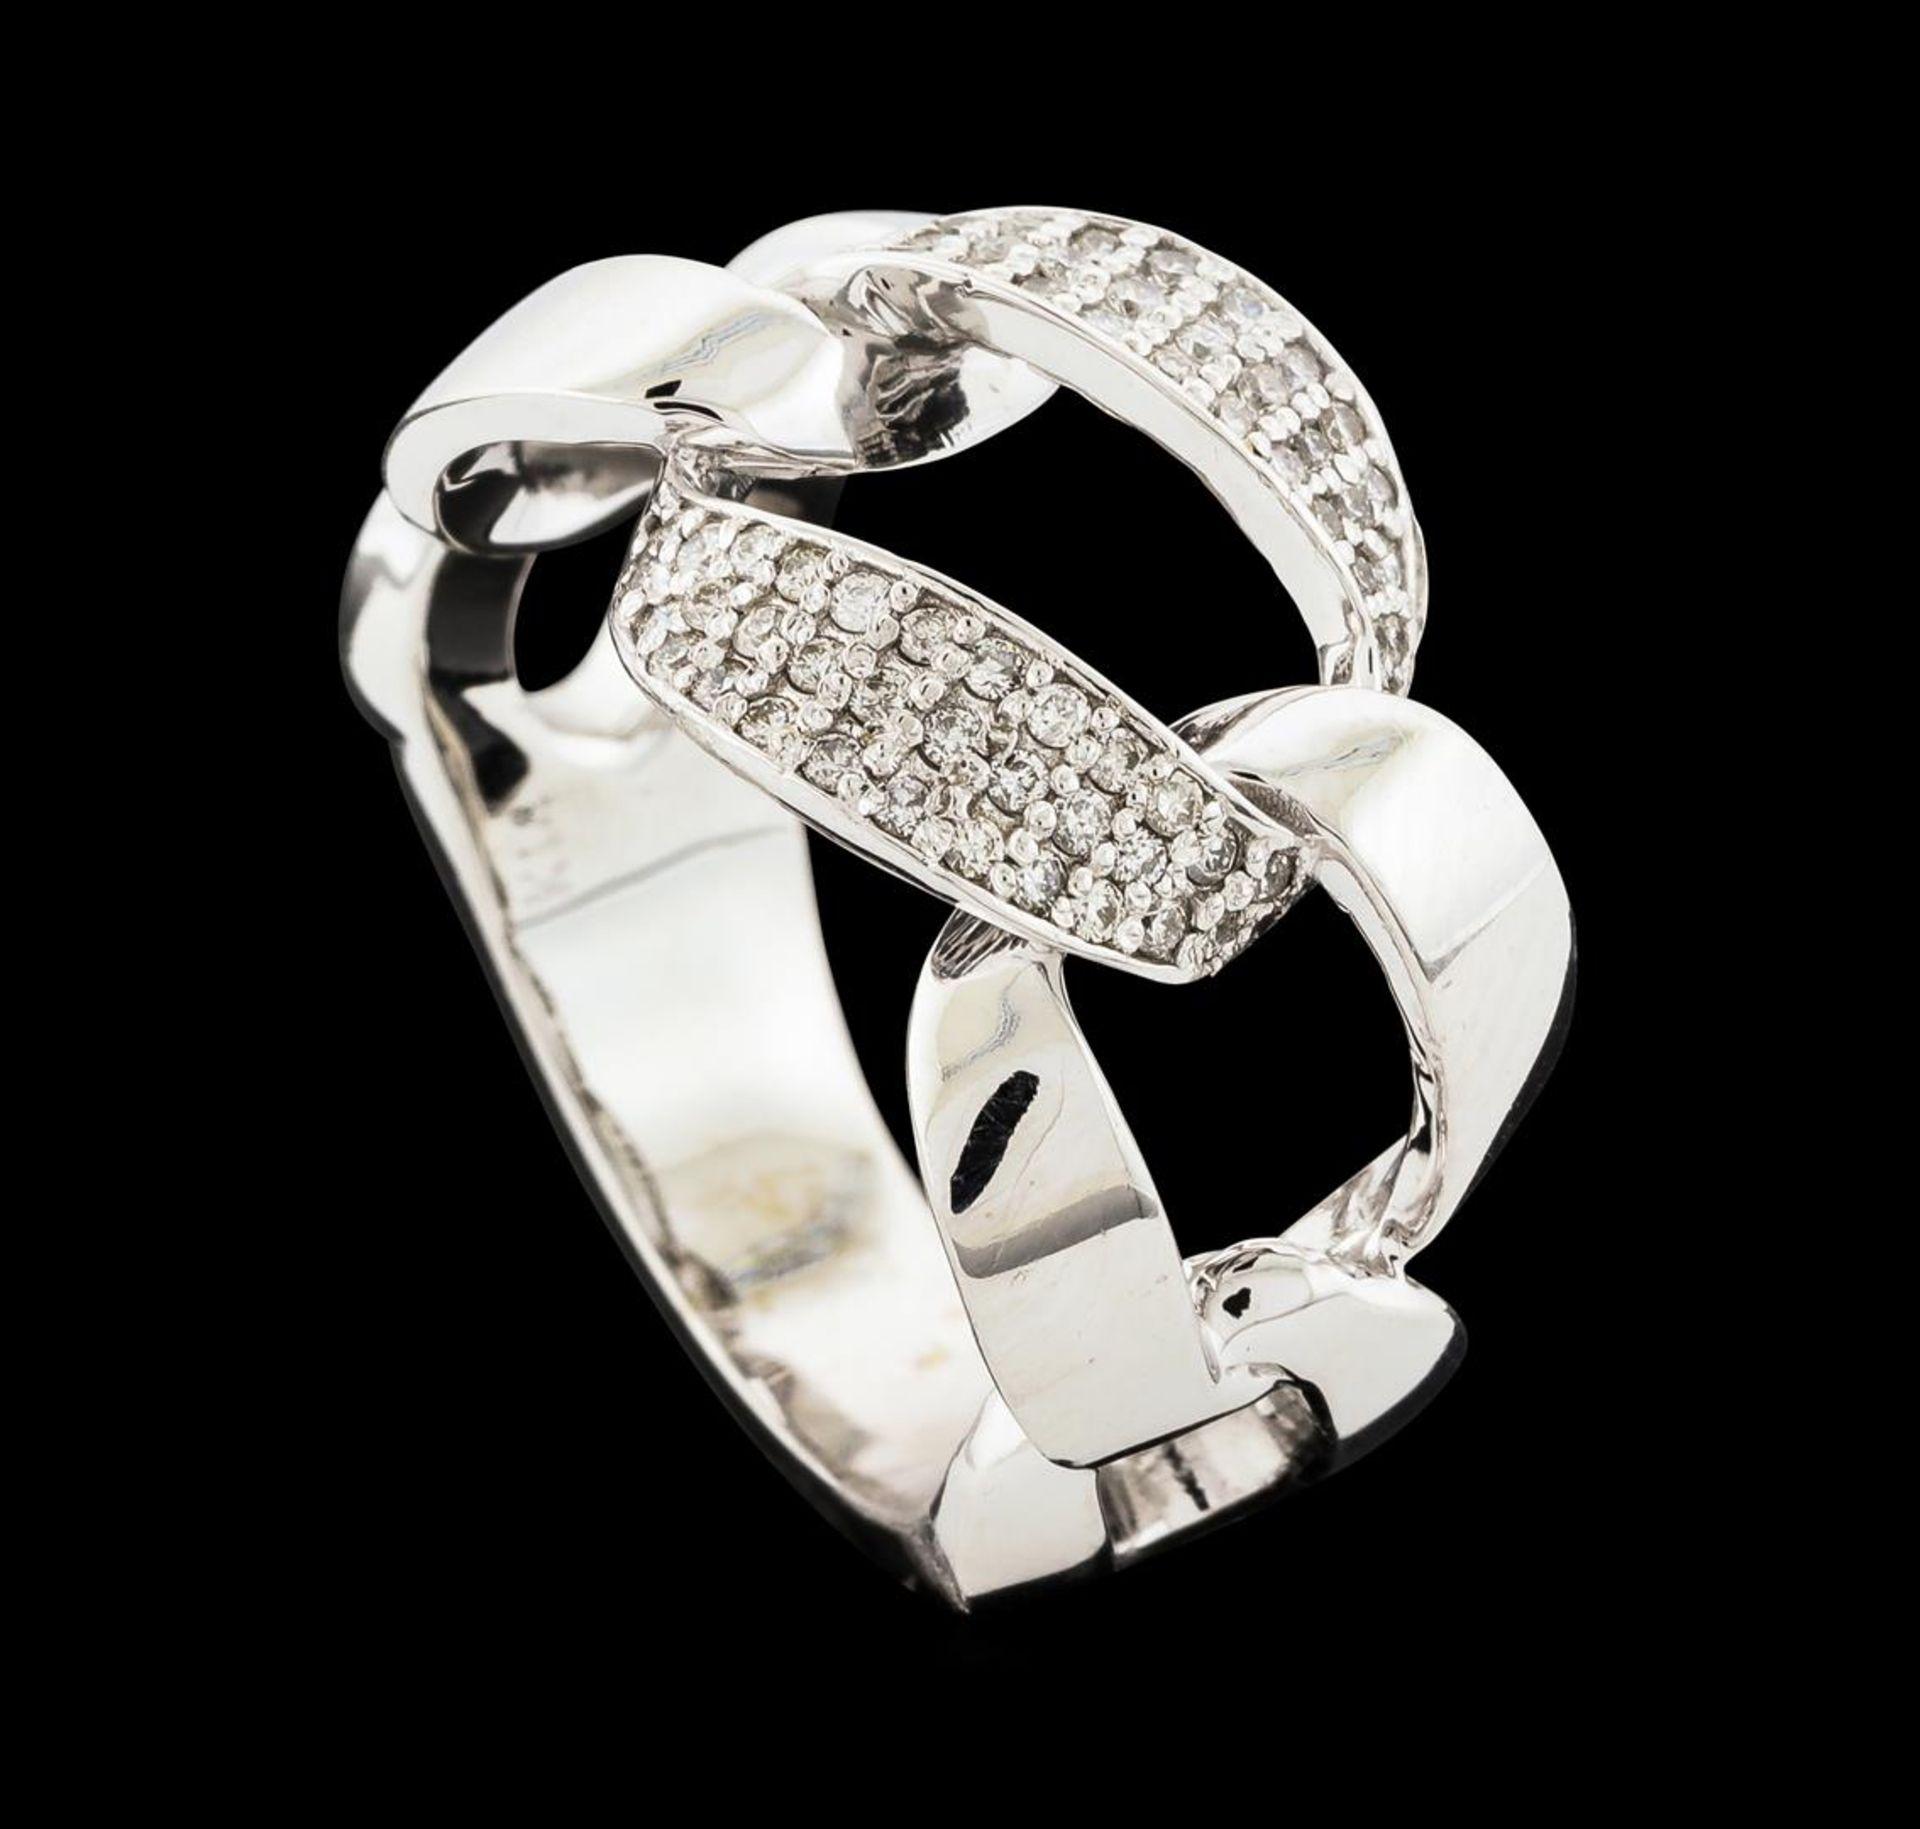 0.33 ctw Diamond Ring - 14KT White Gold - Image 4 of 4